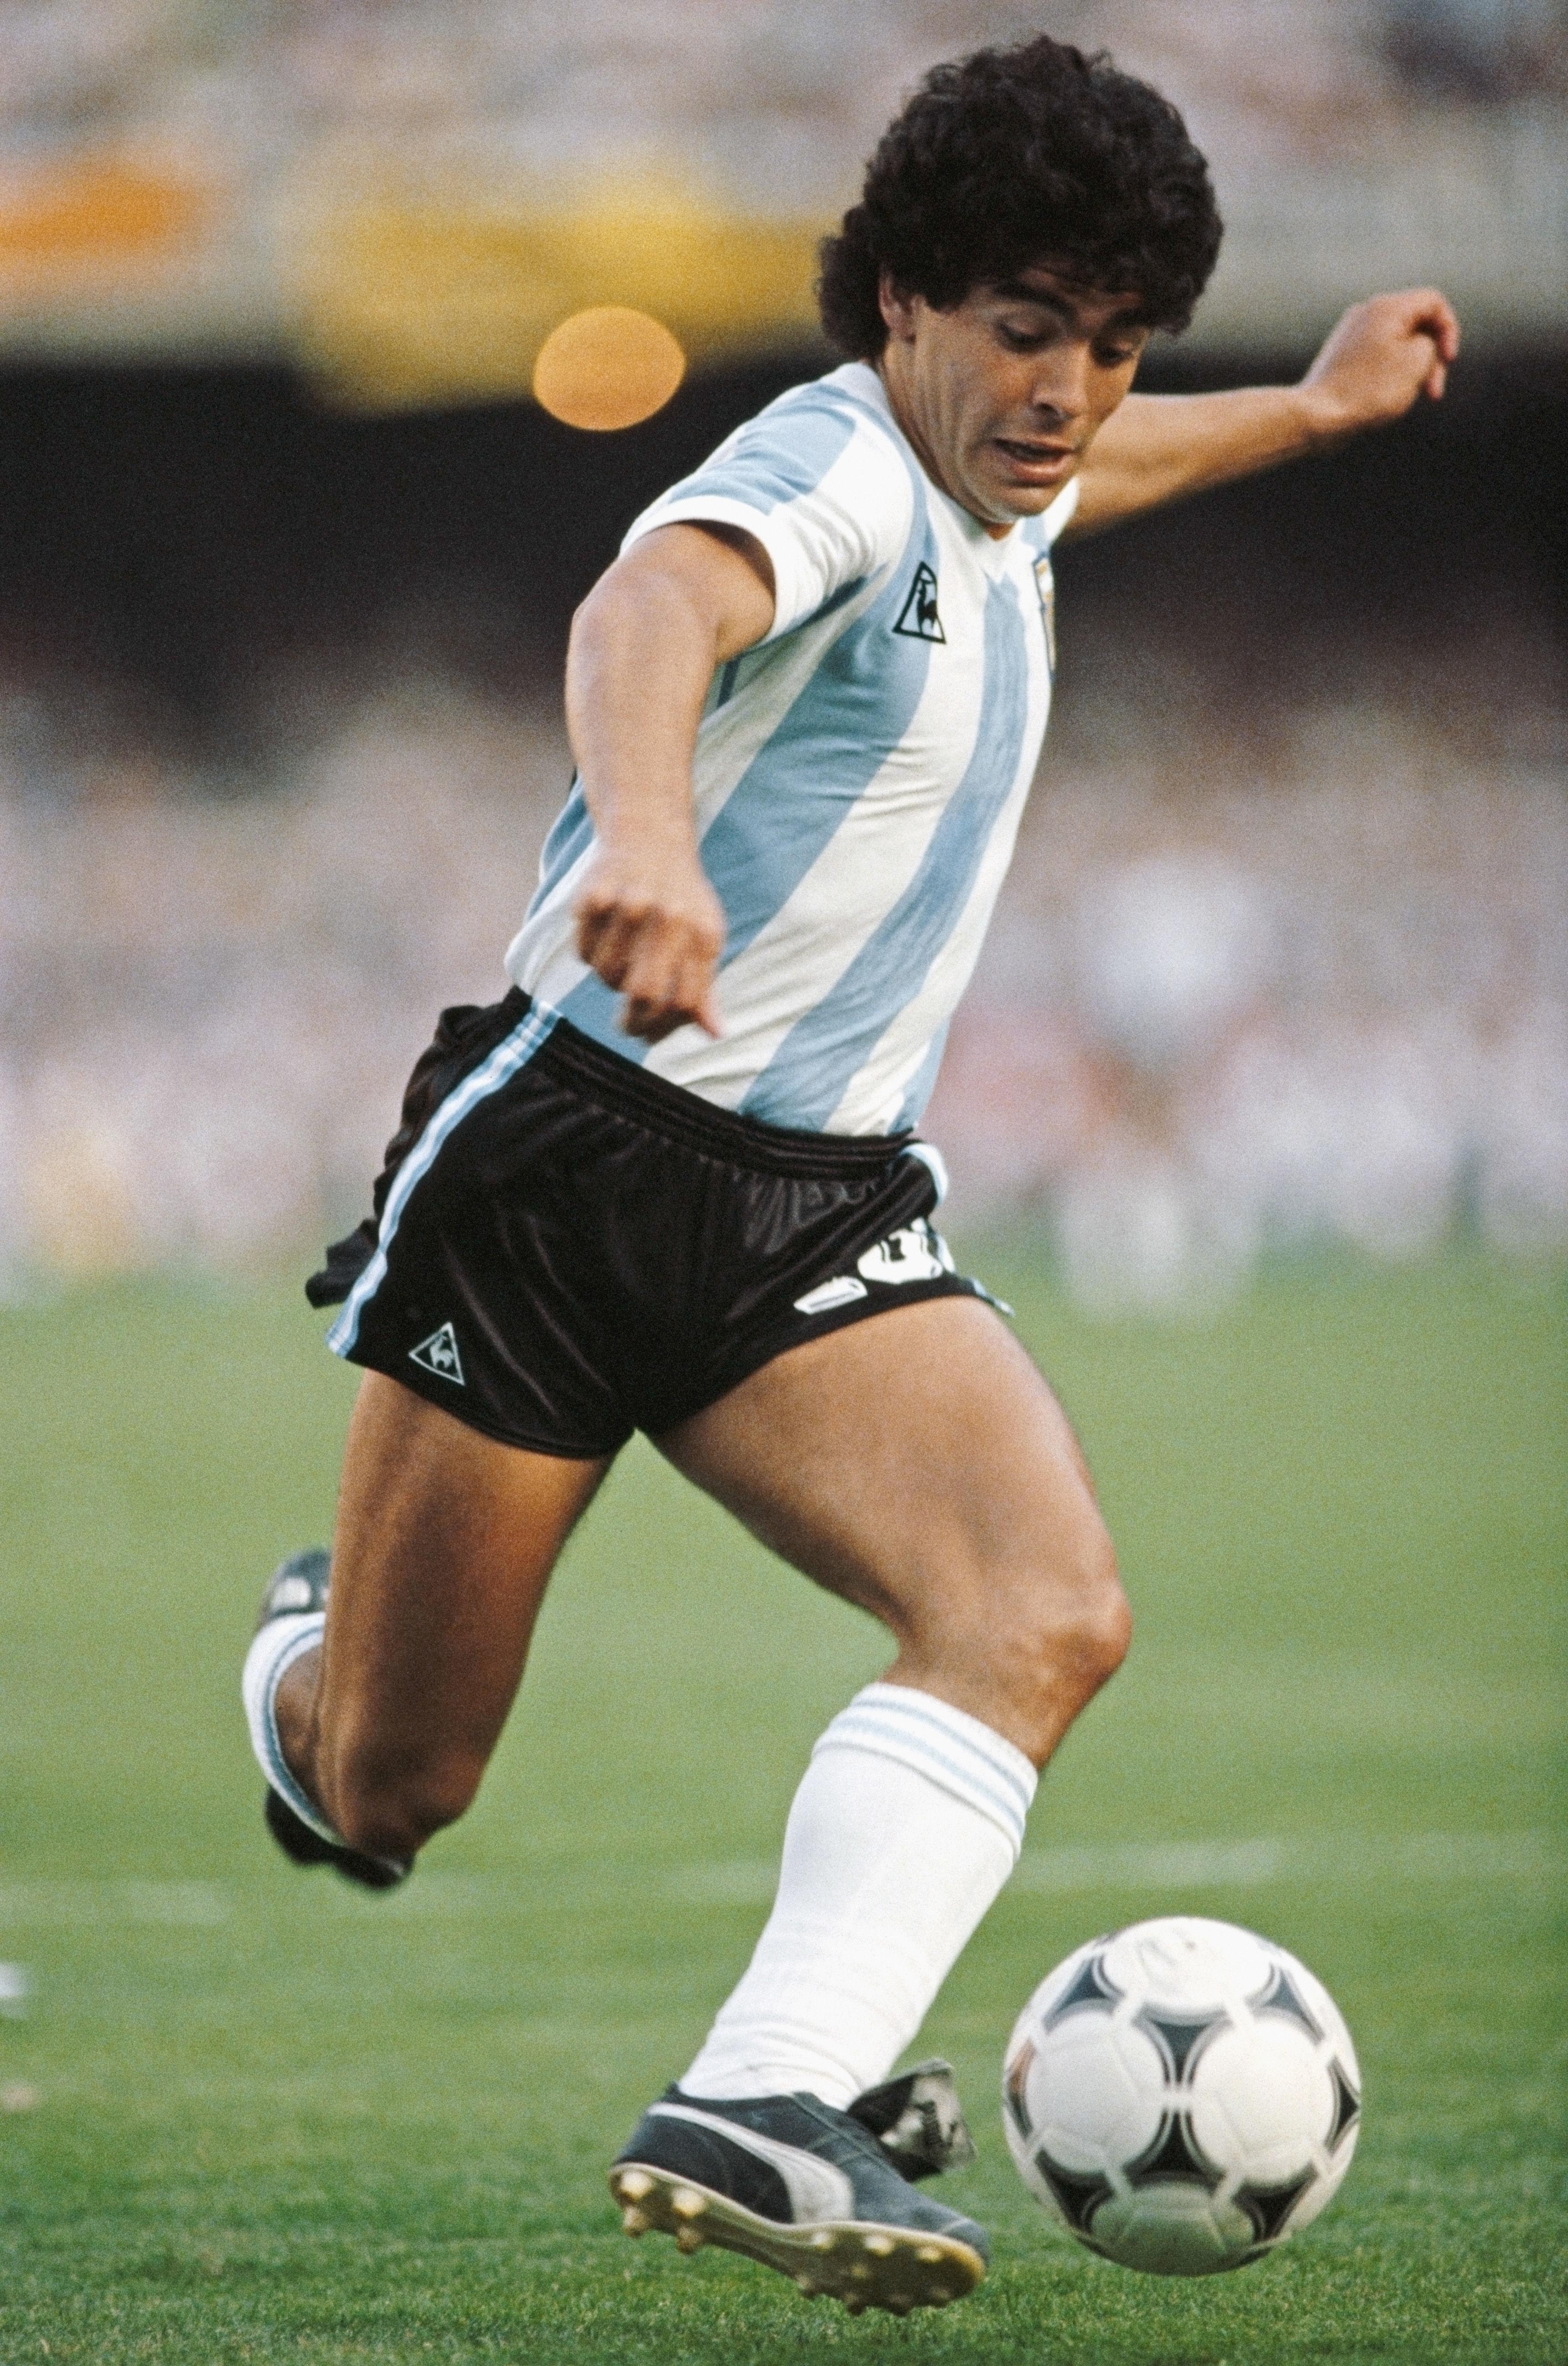 Символ футбола. ФОТО галерея памяти Диего Марадоны - фото 39